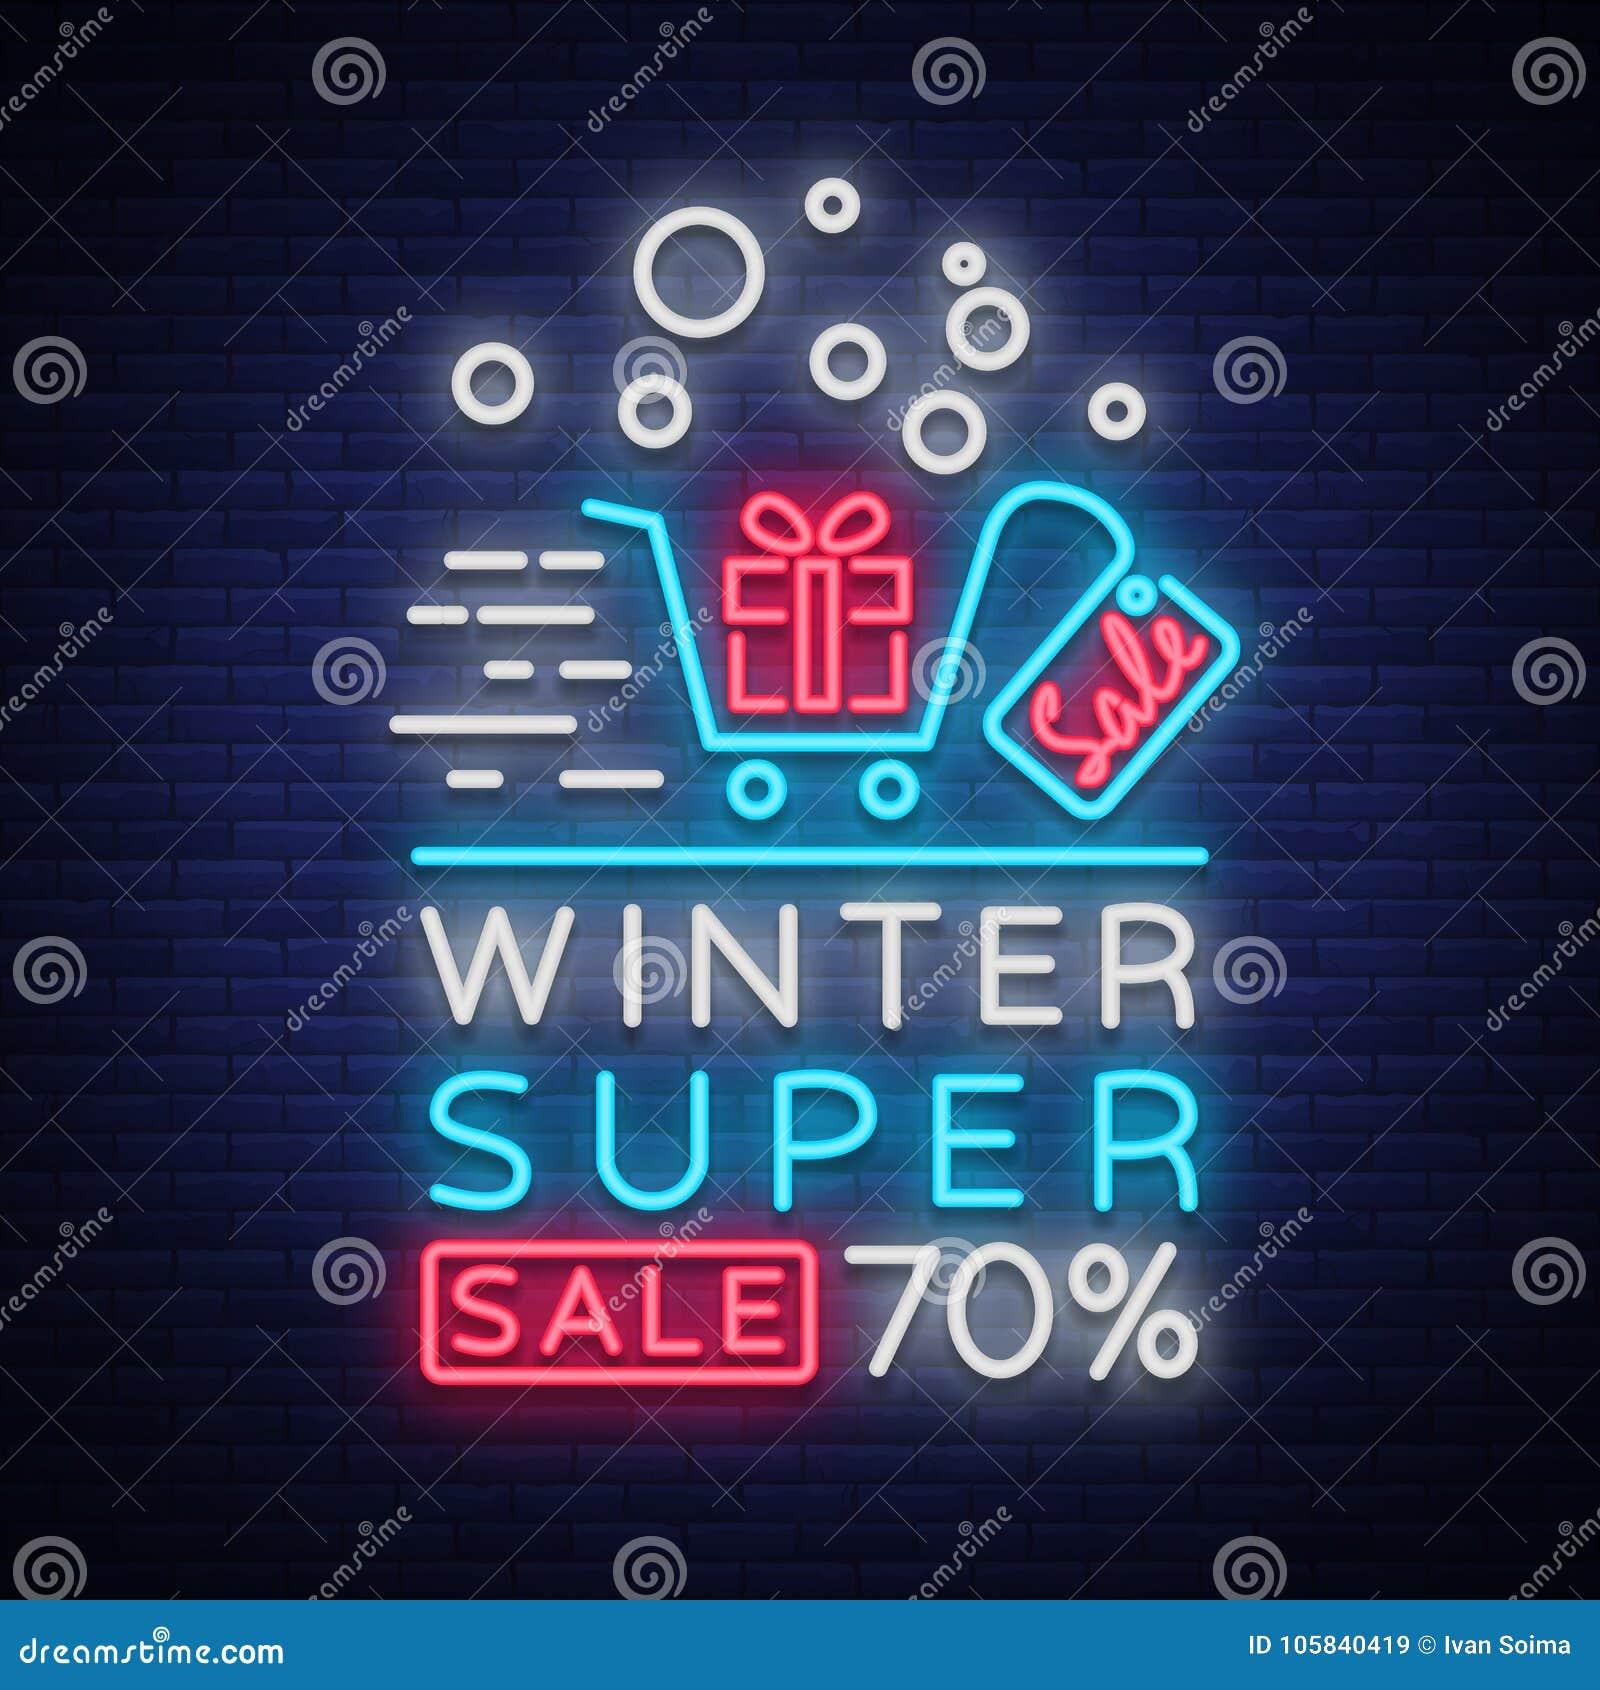 winter sale vector  neon sign  poster  bright flyer  neon